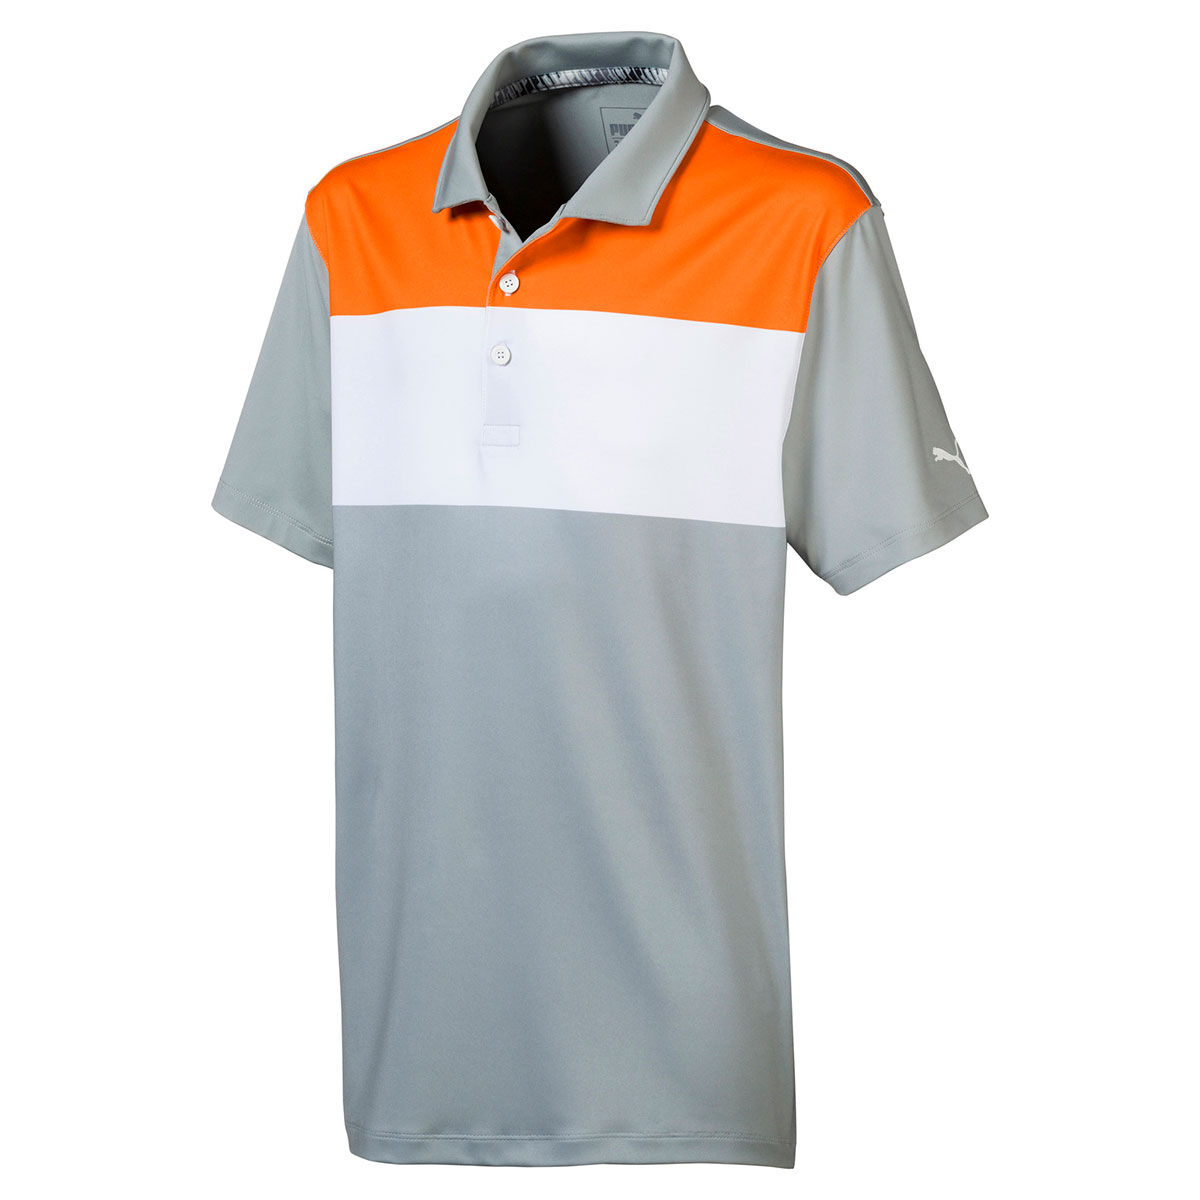 921350812 PUMA Golf Junior Nineties Polo Shirt | Online